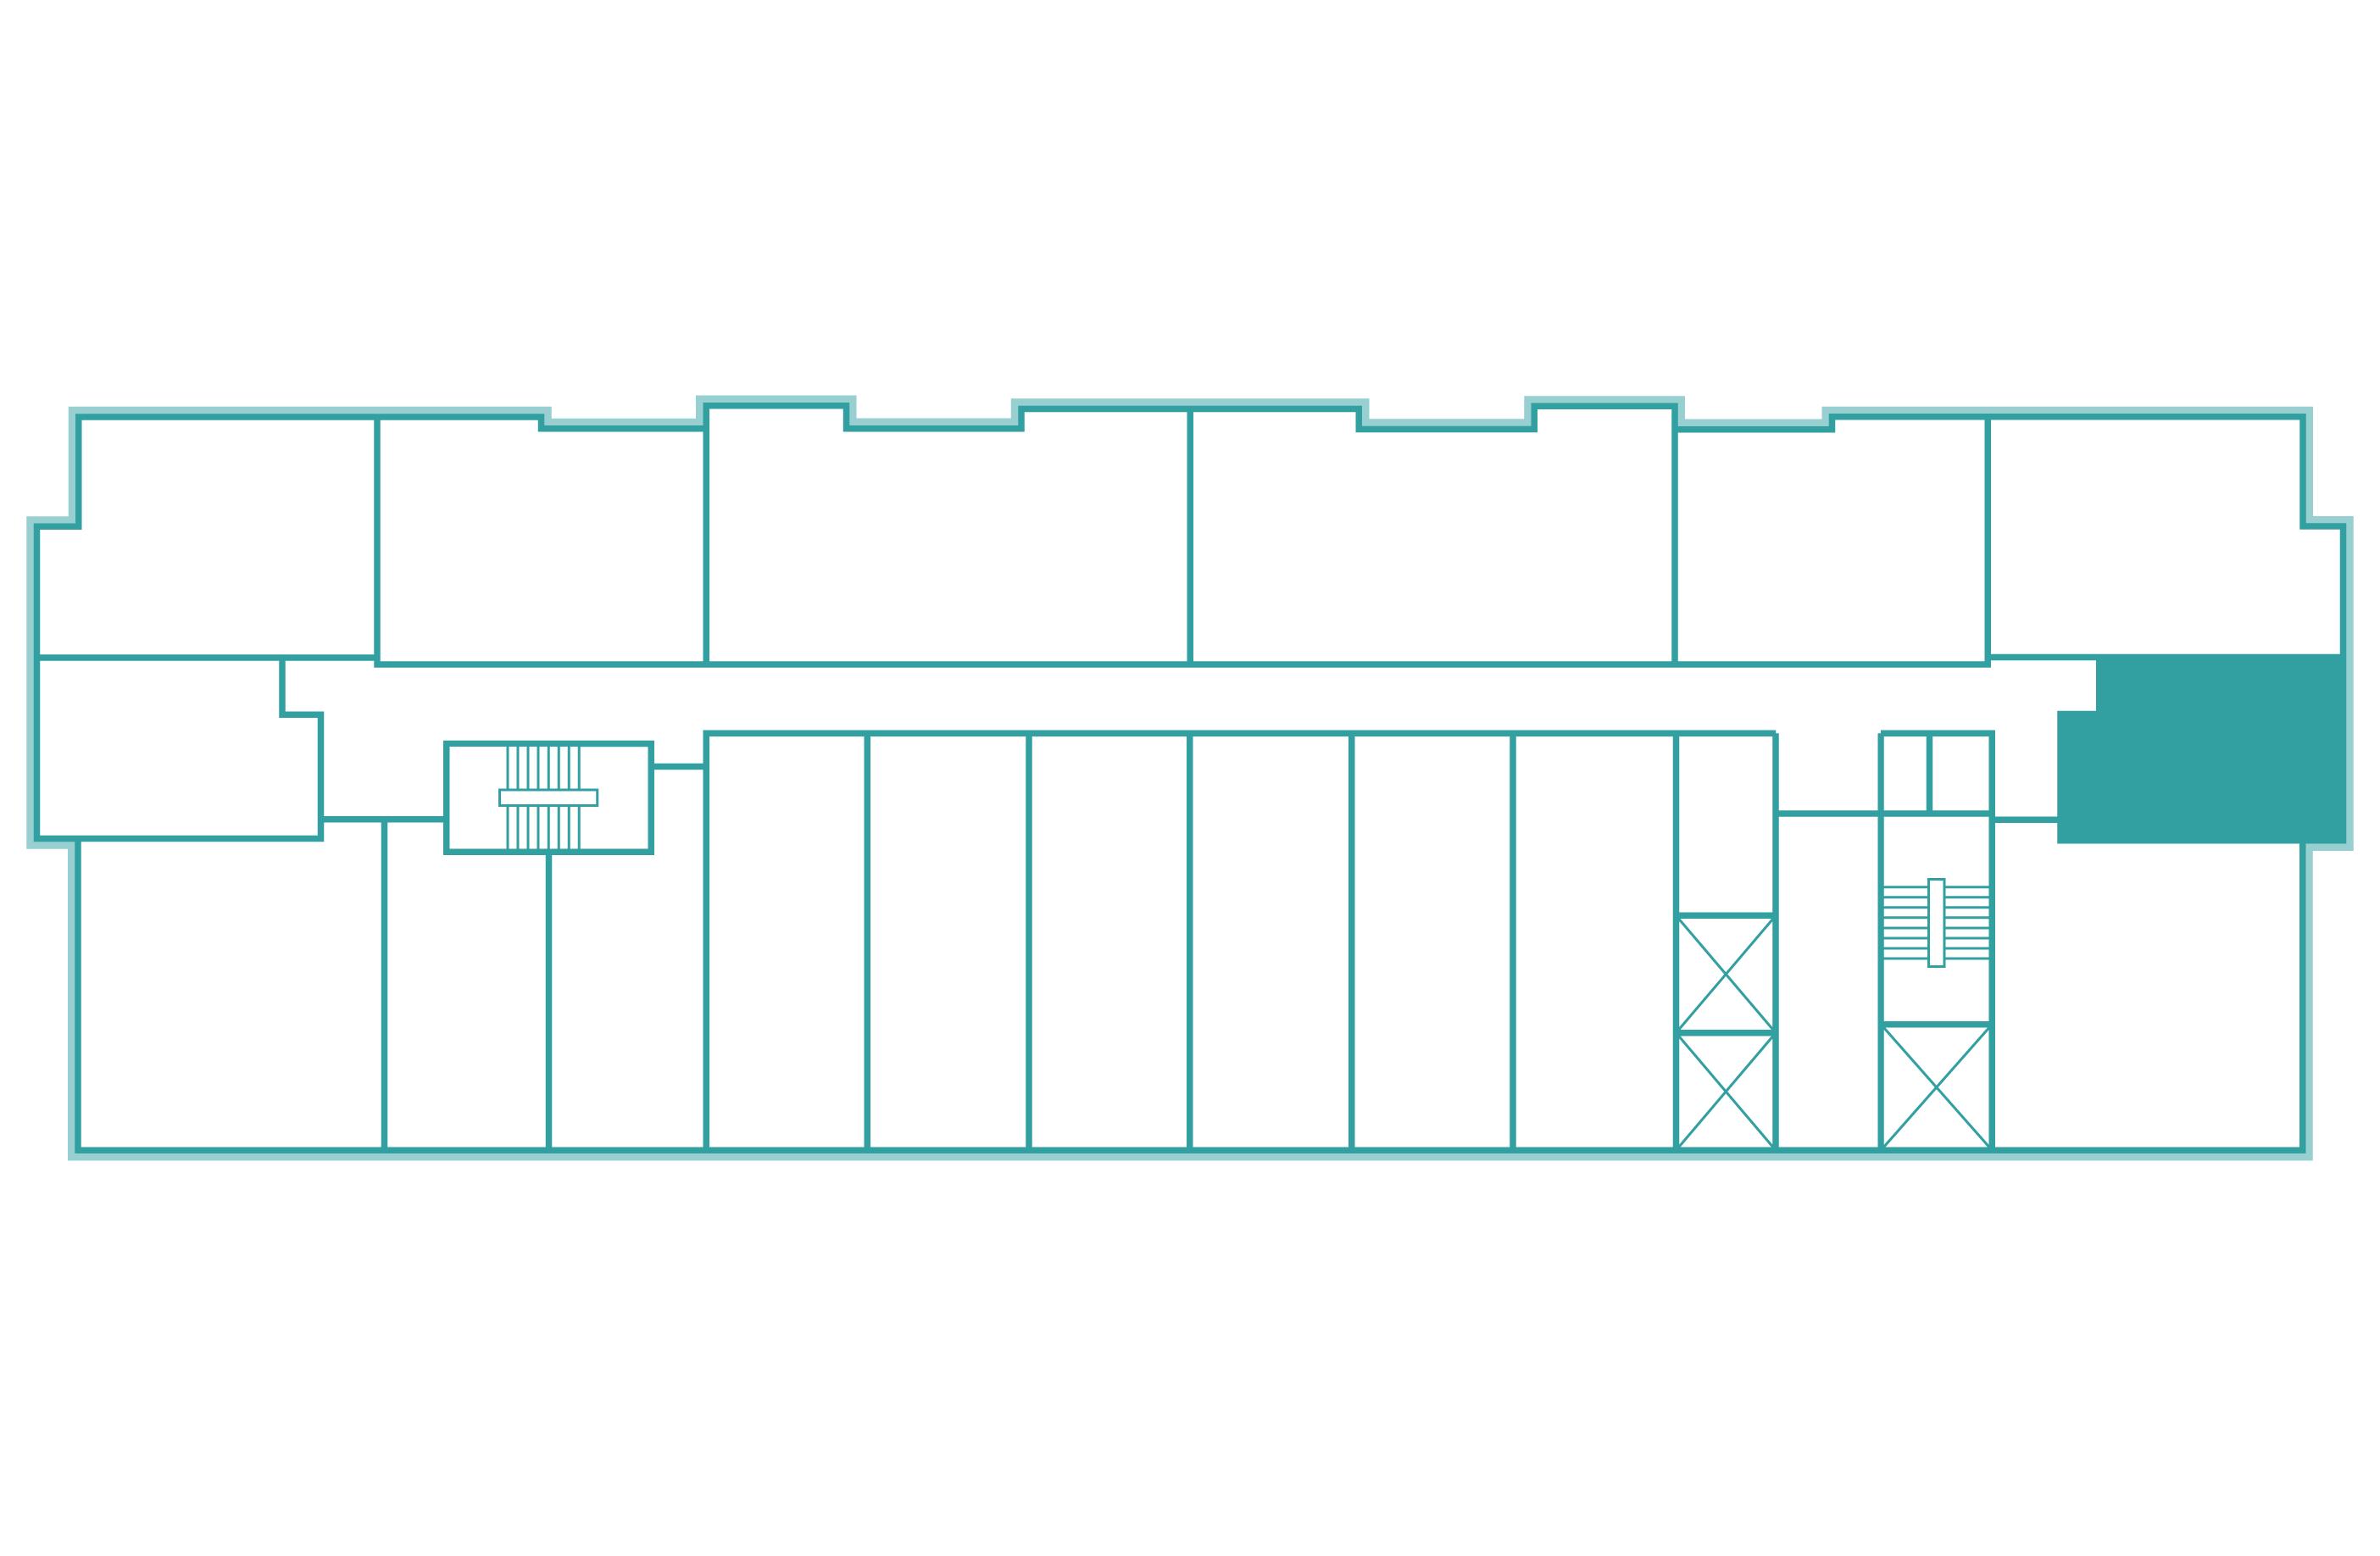 floorplan image of unit image 0818